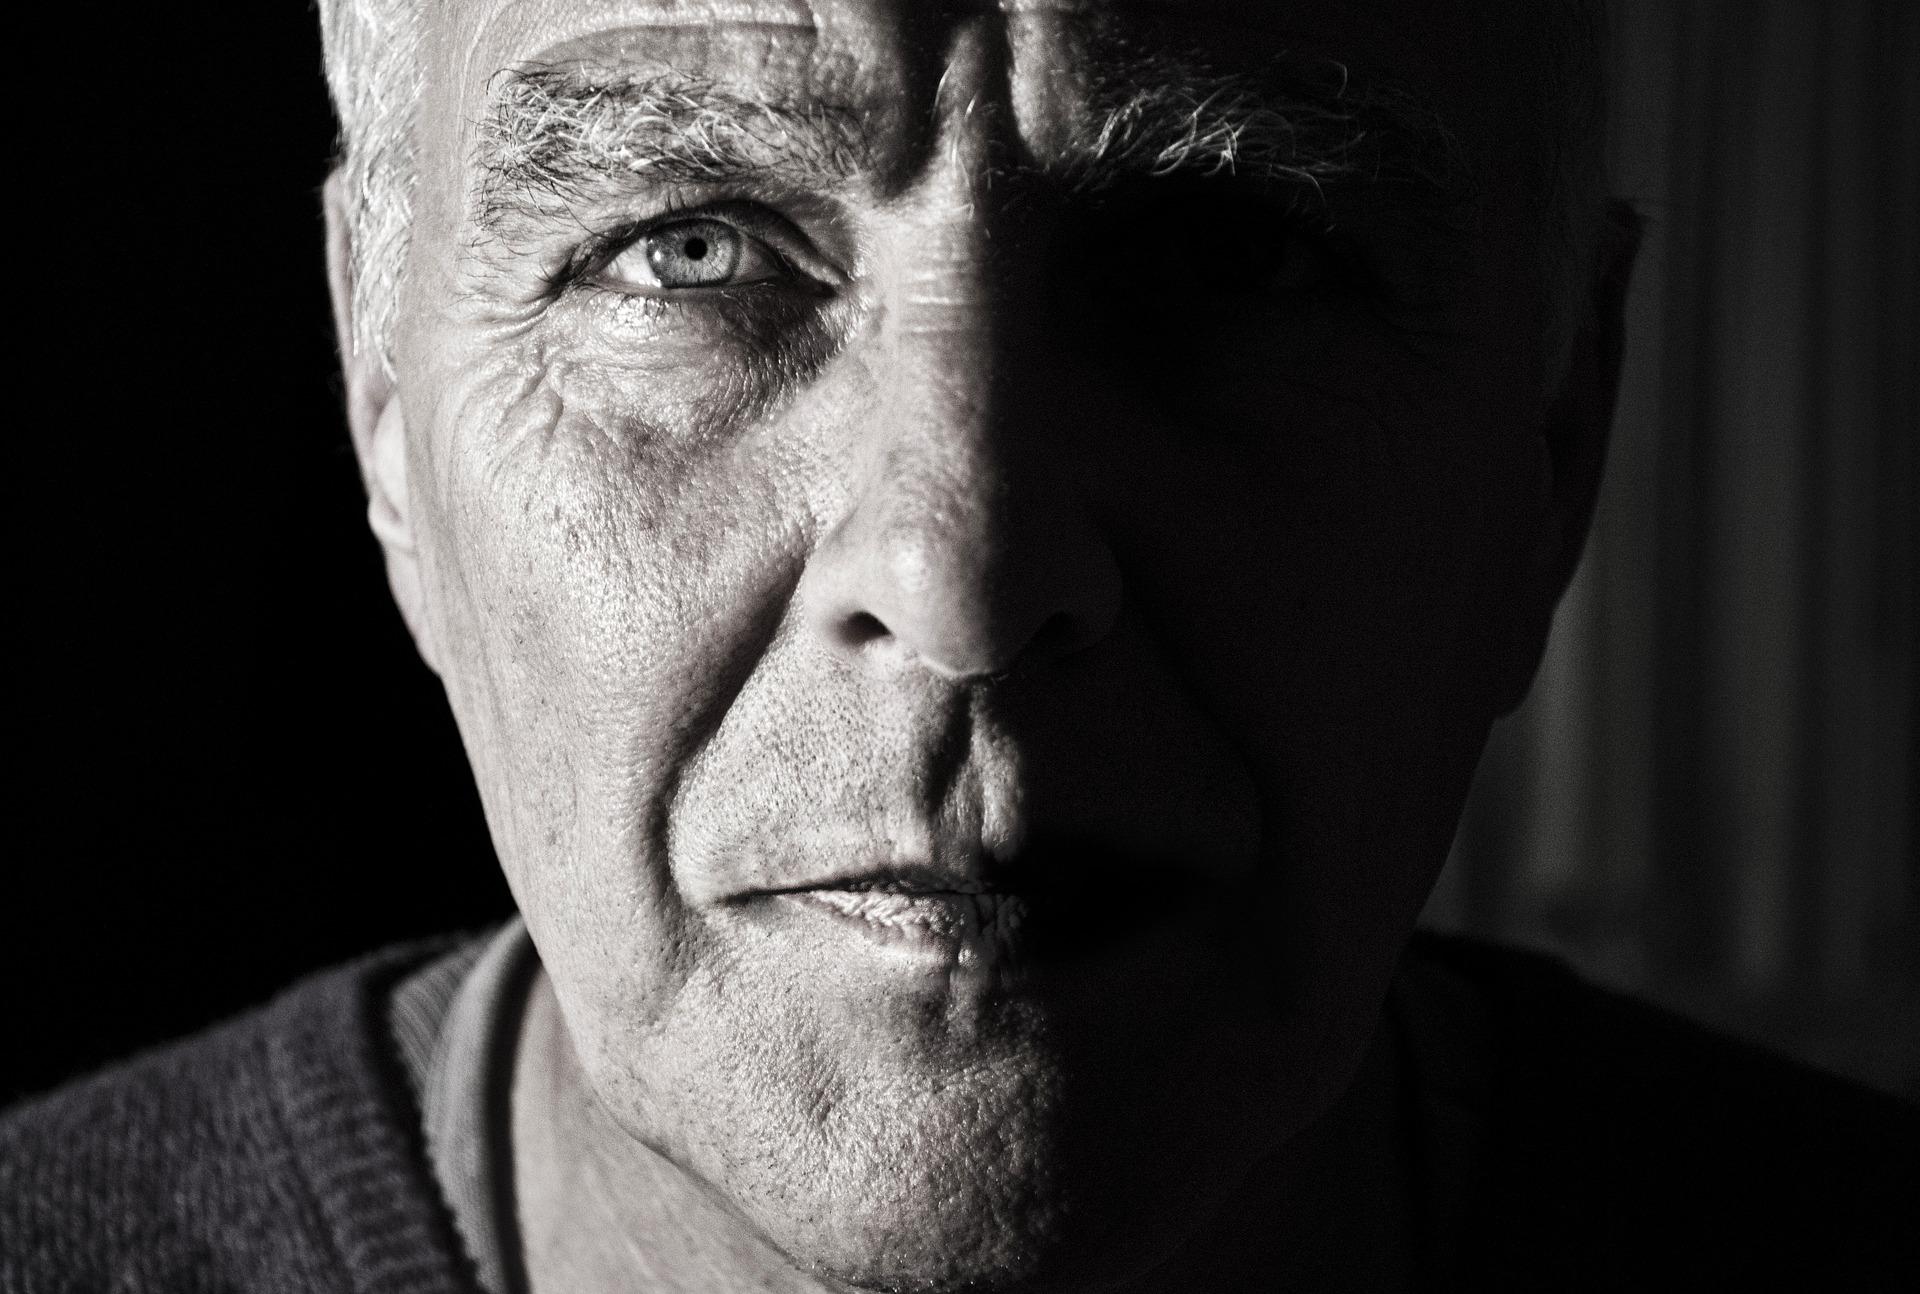 STEM CELL REP:烟酰胺可缓解纤维化眼病及视力丧失